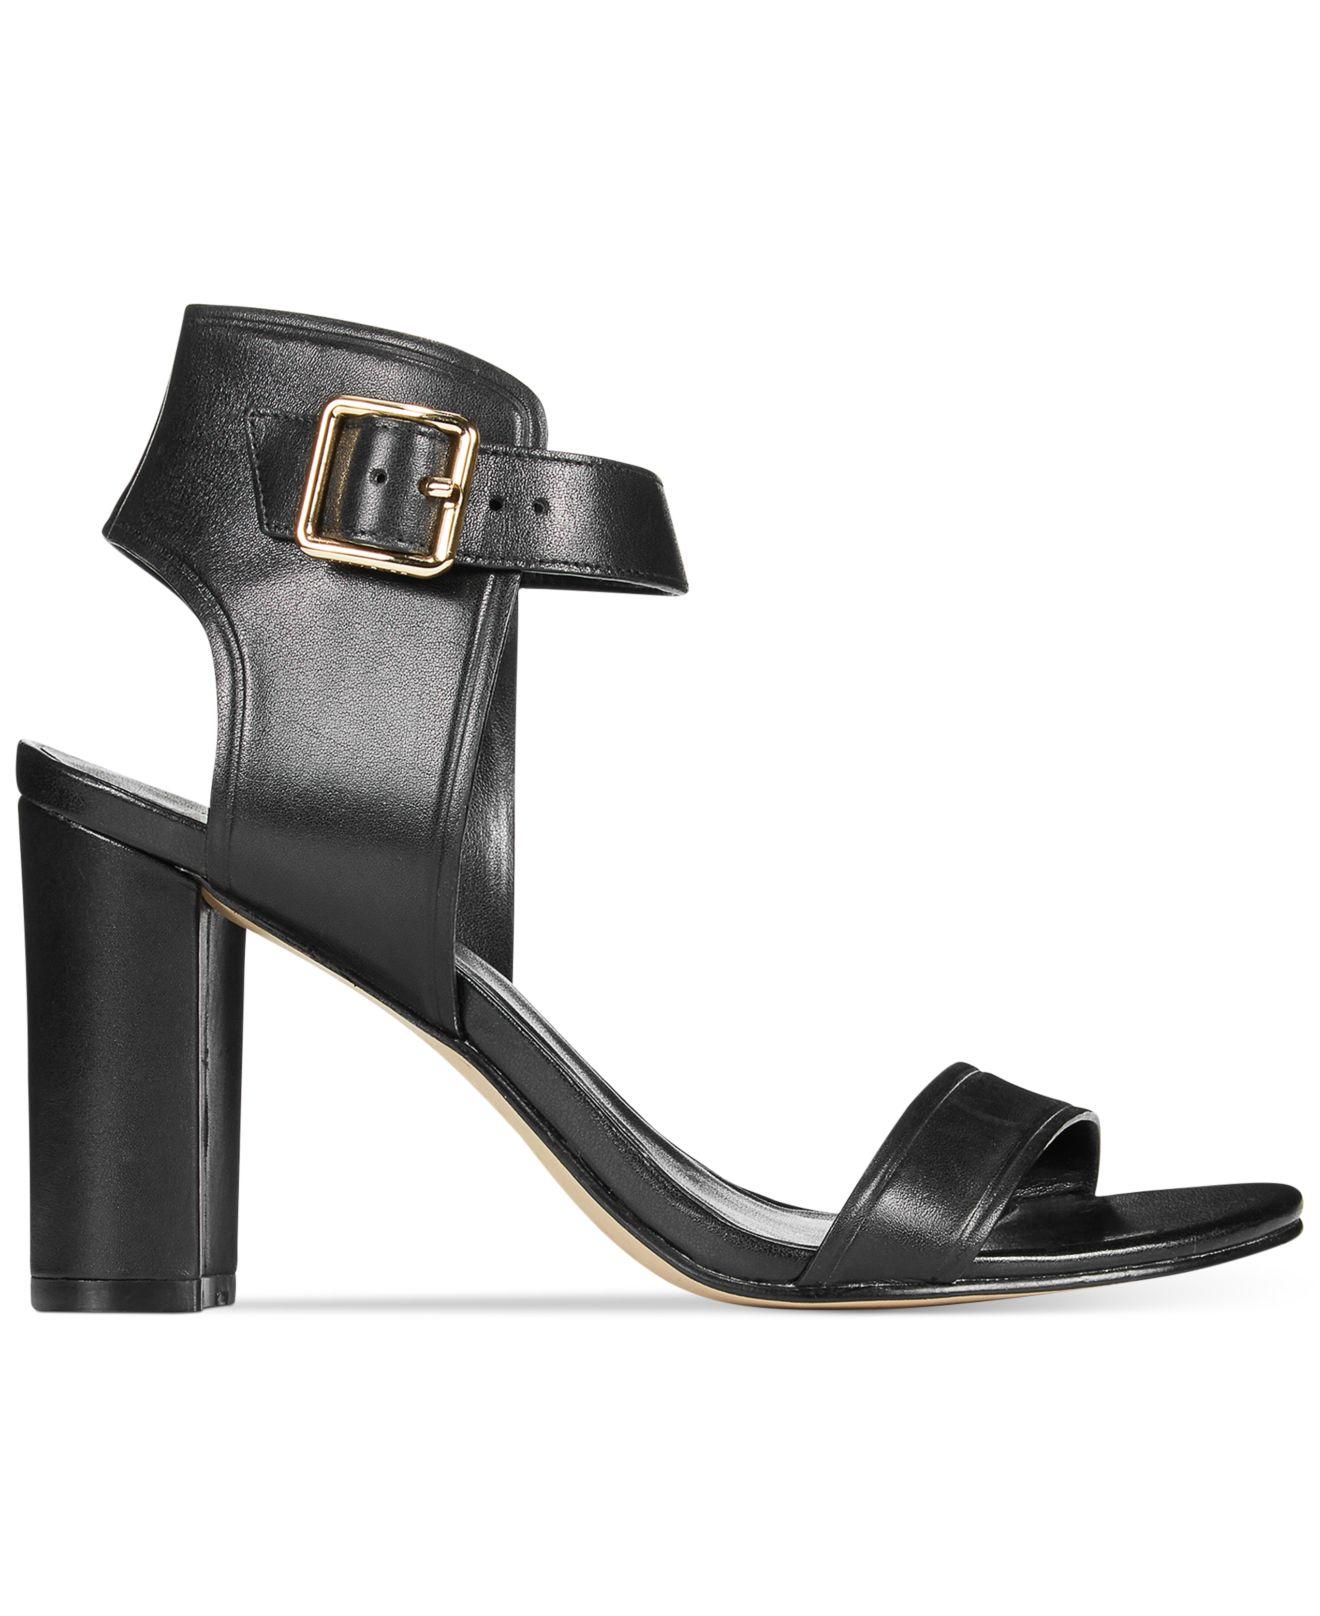 Womens Black High Heel Sandals